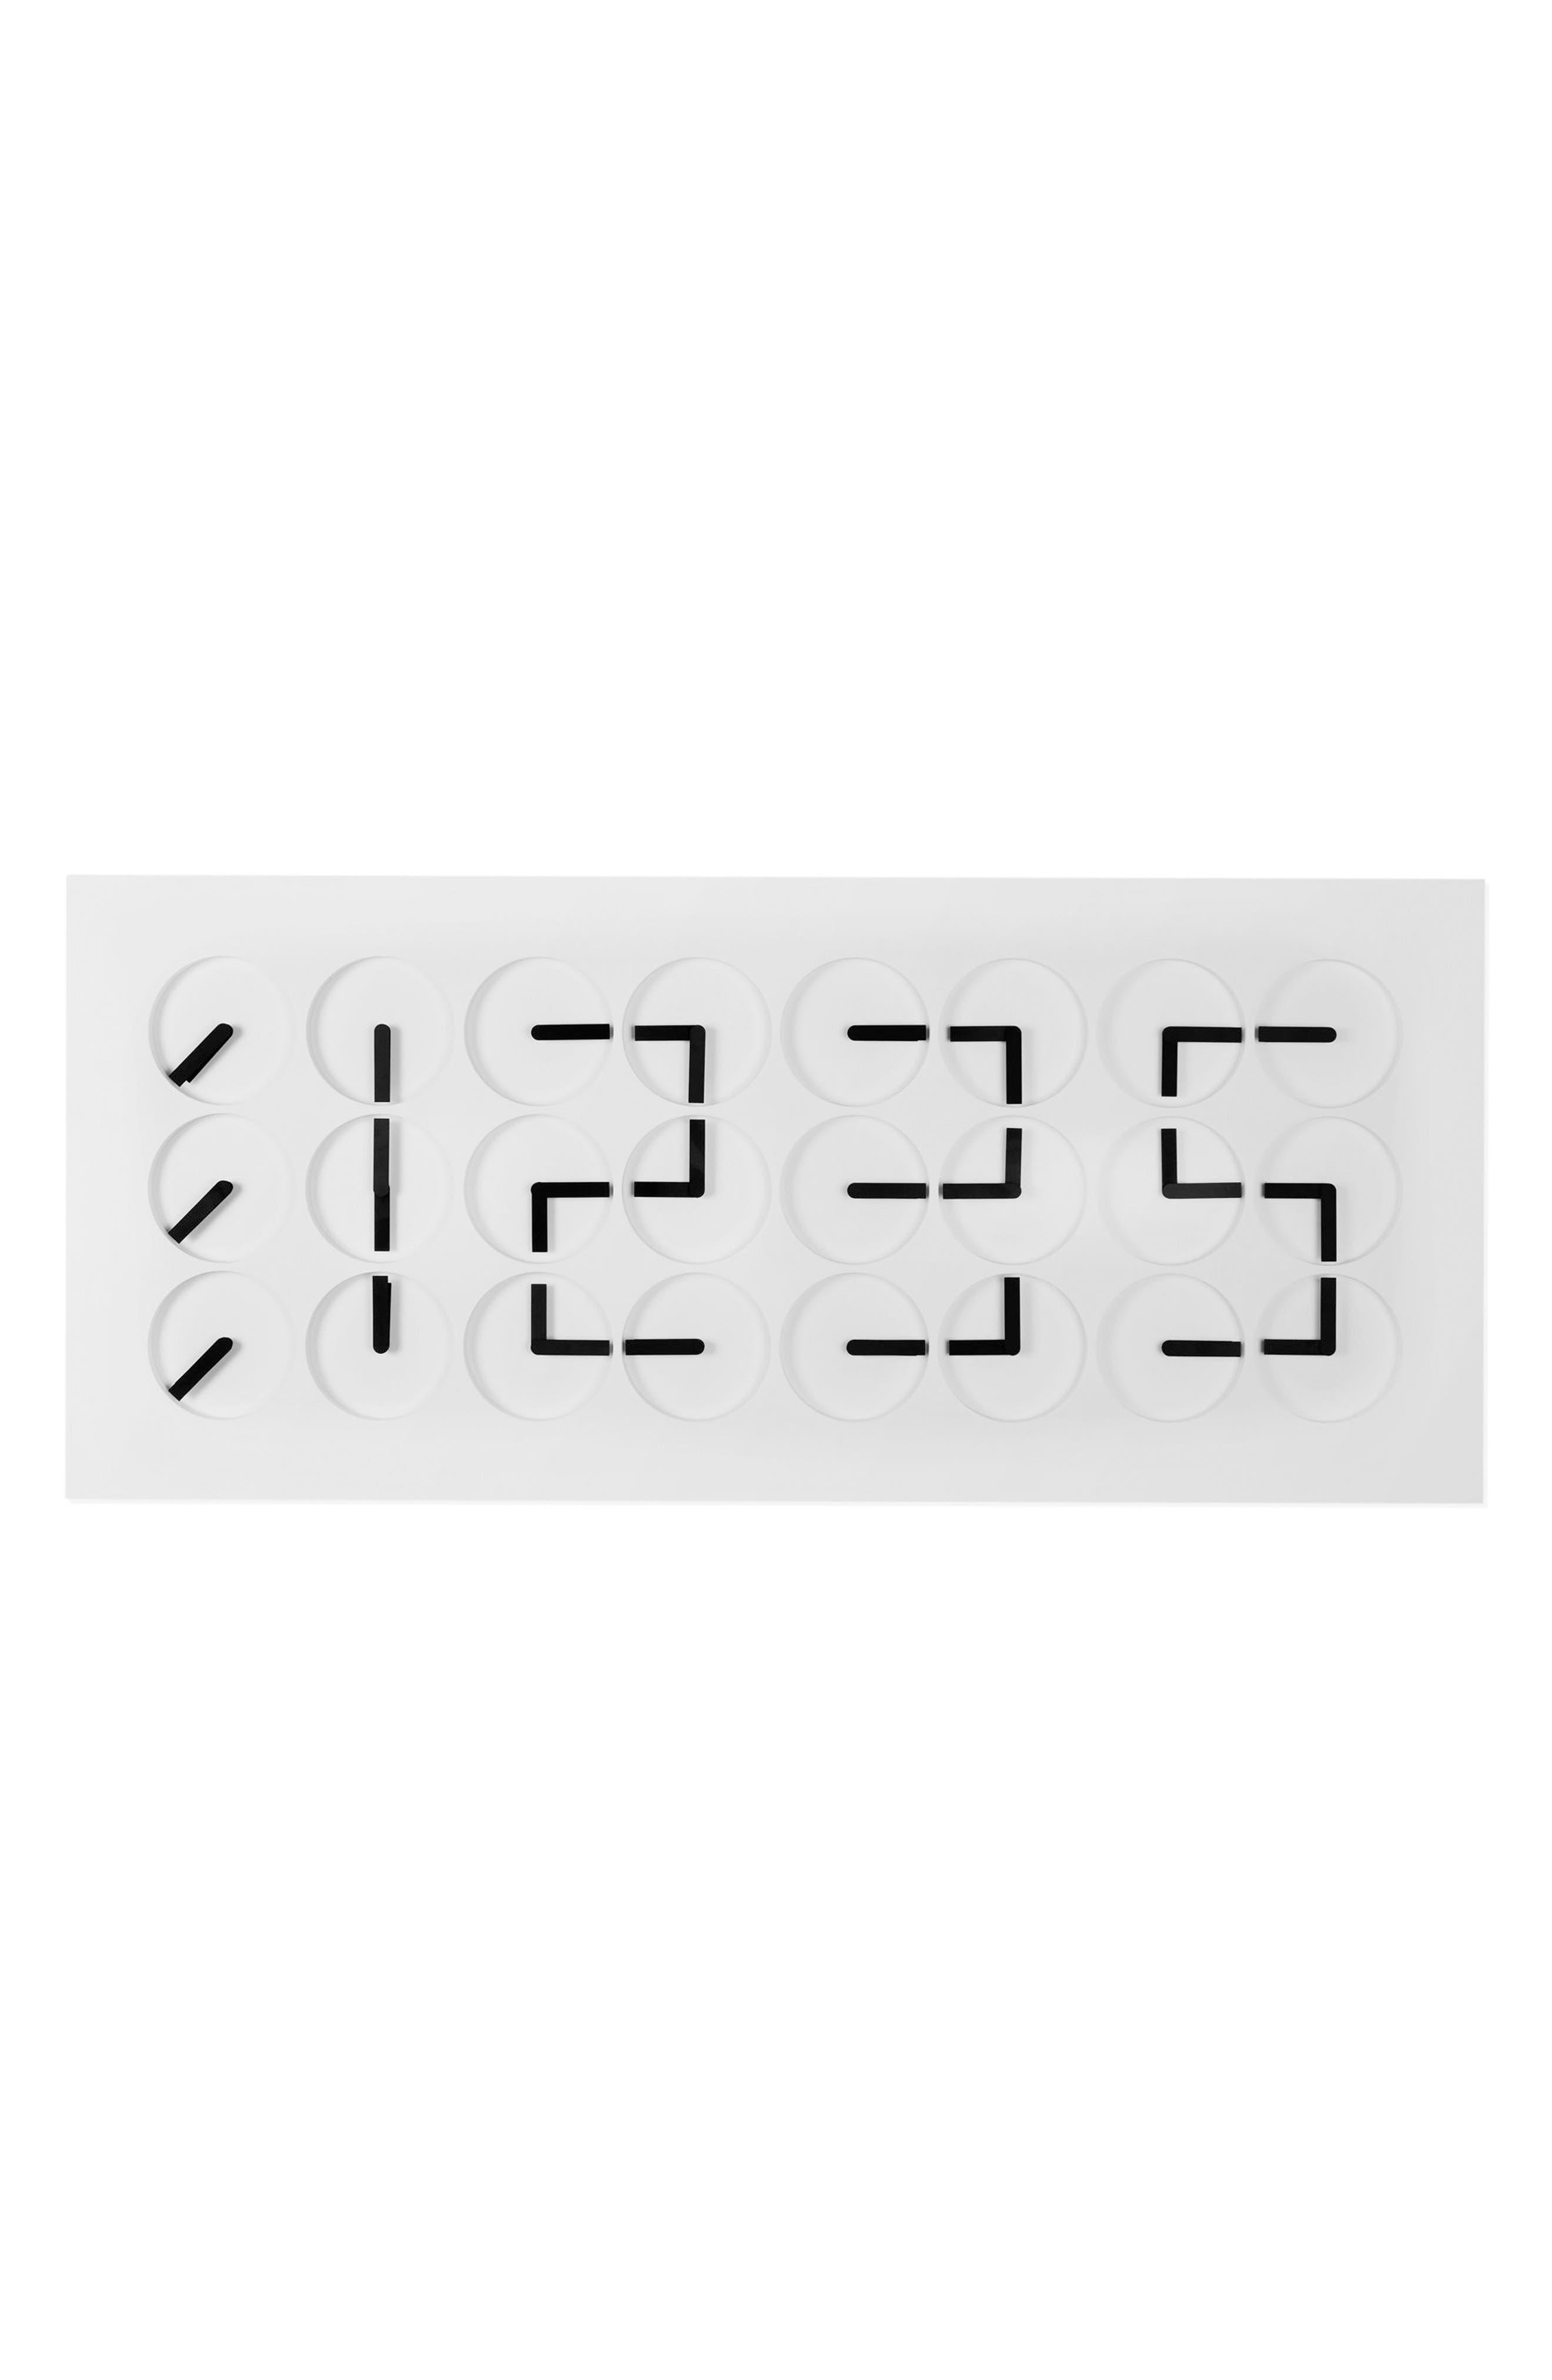 MoMA Design Store ClockClock 24 Digital Clock